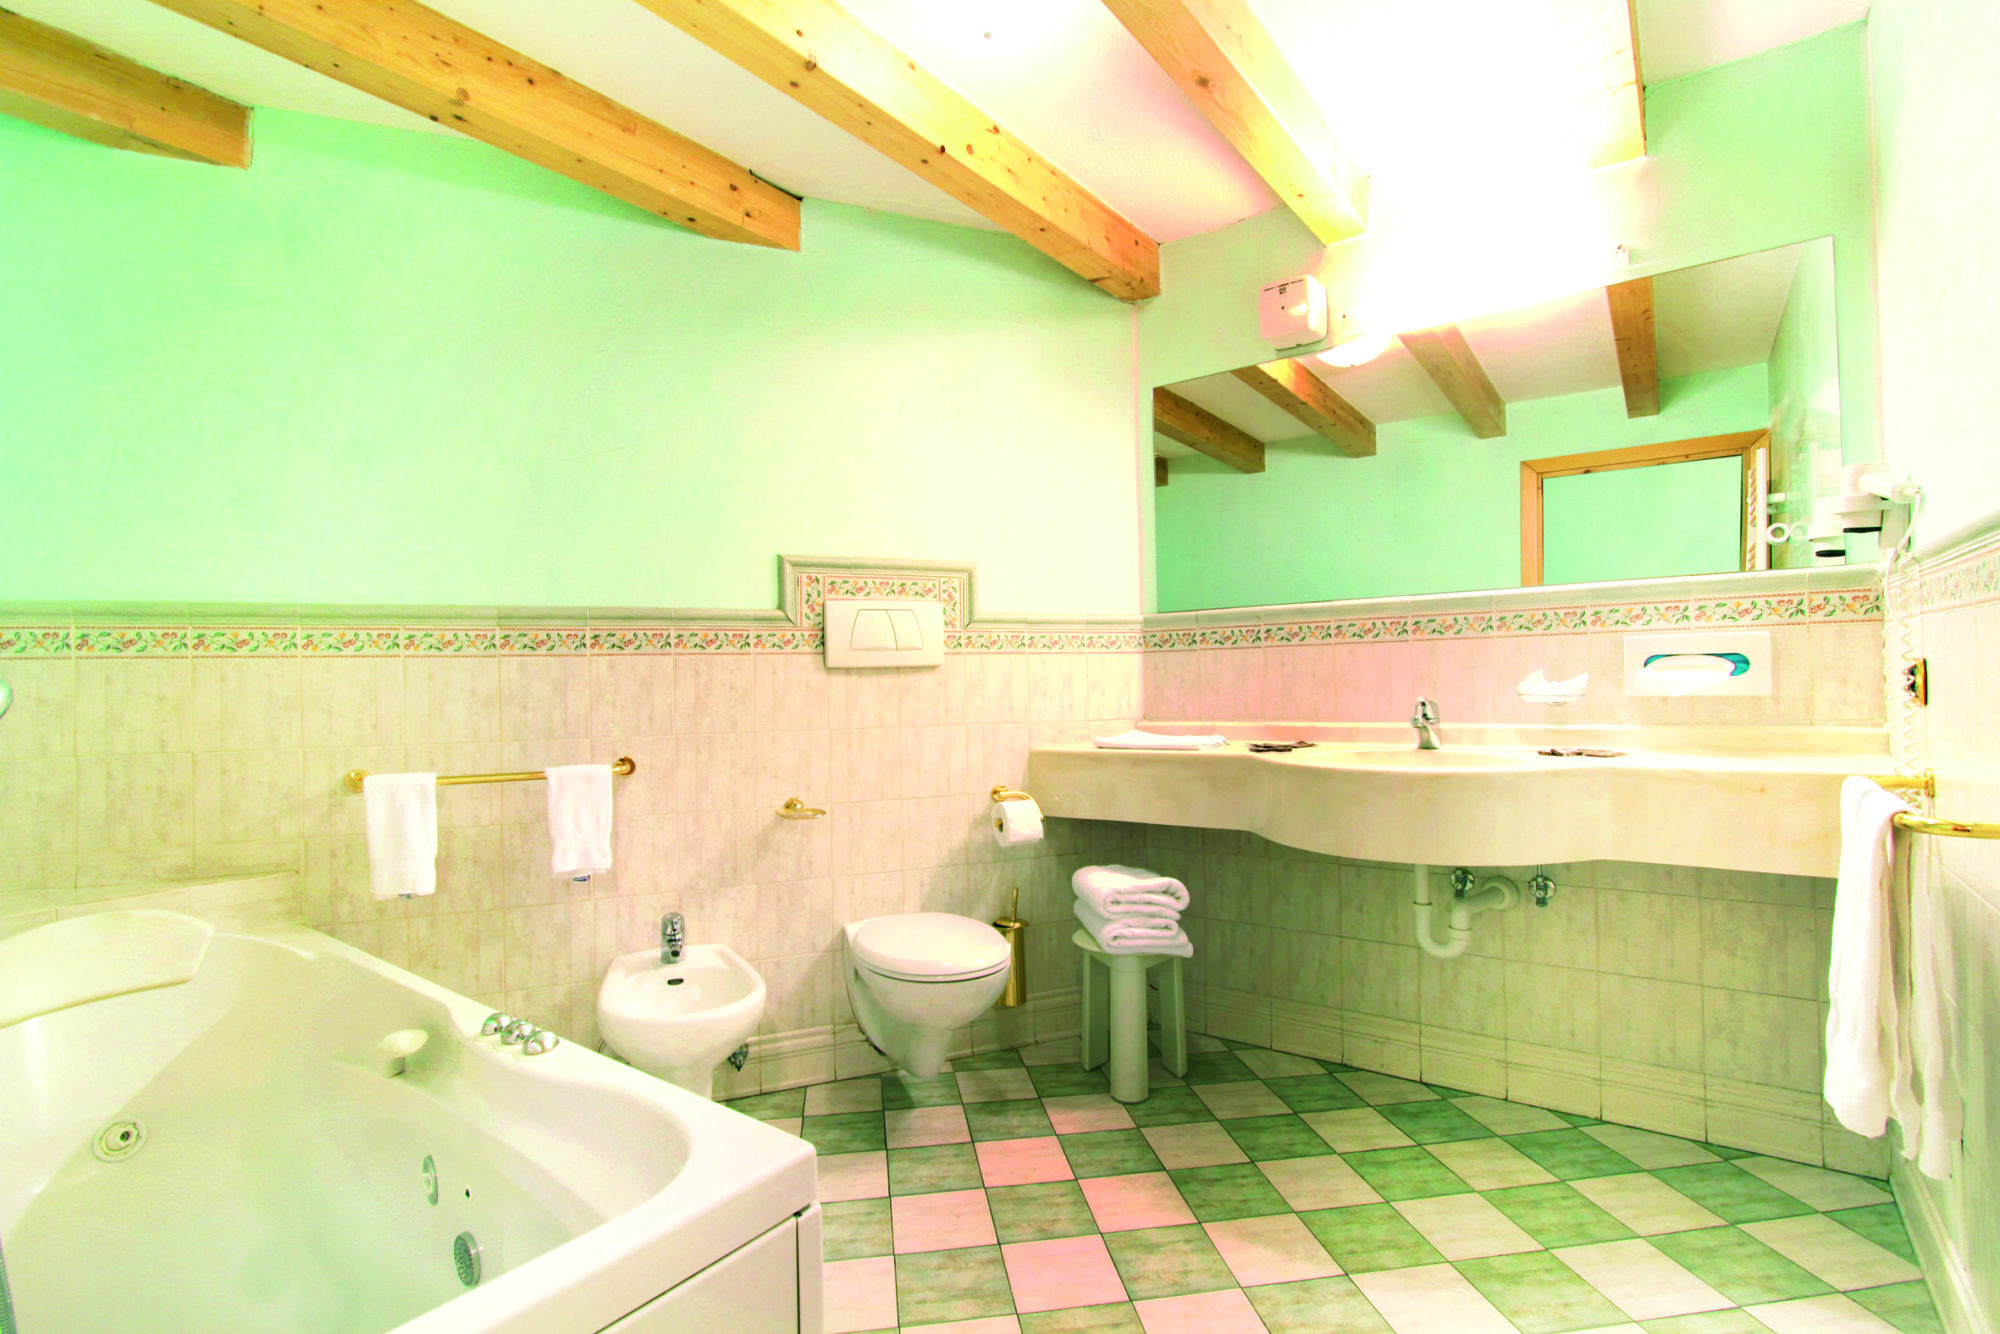 17 Hotel Soreghes - bathroom